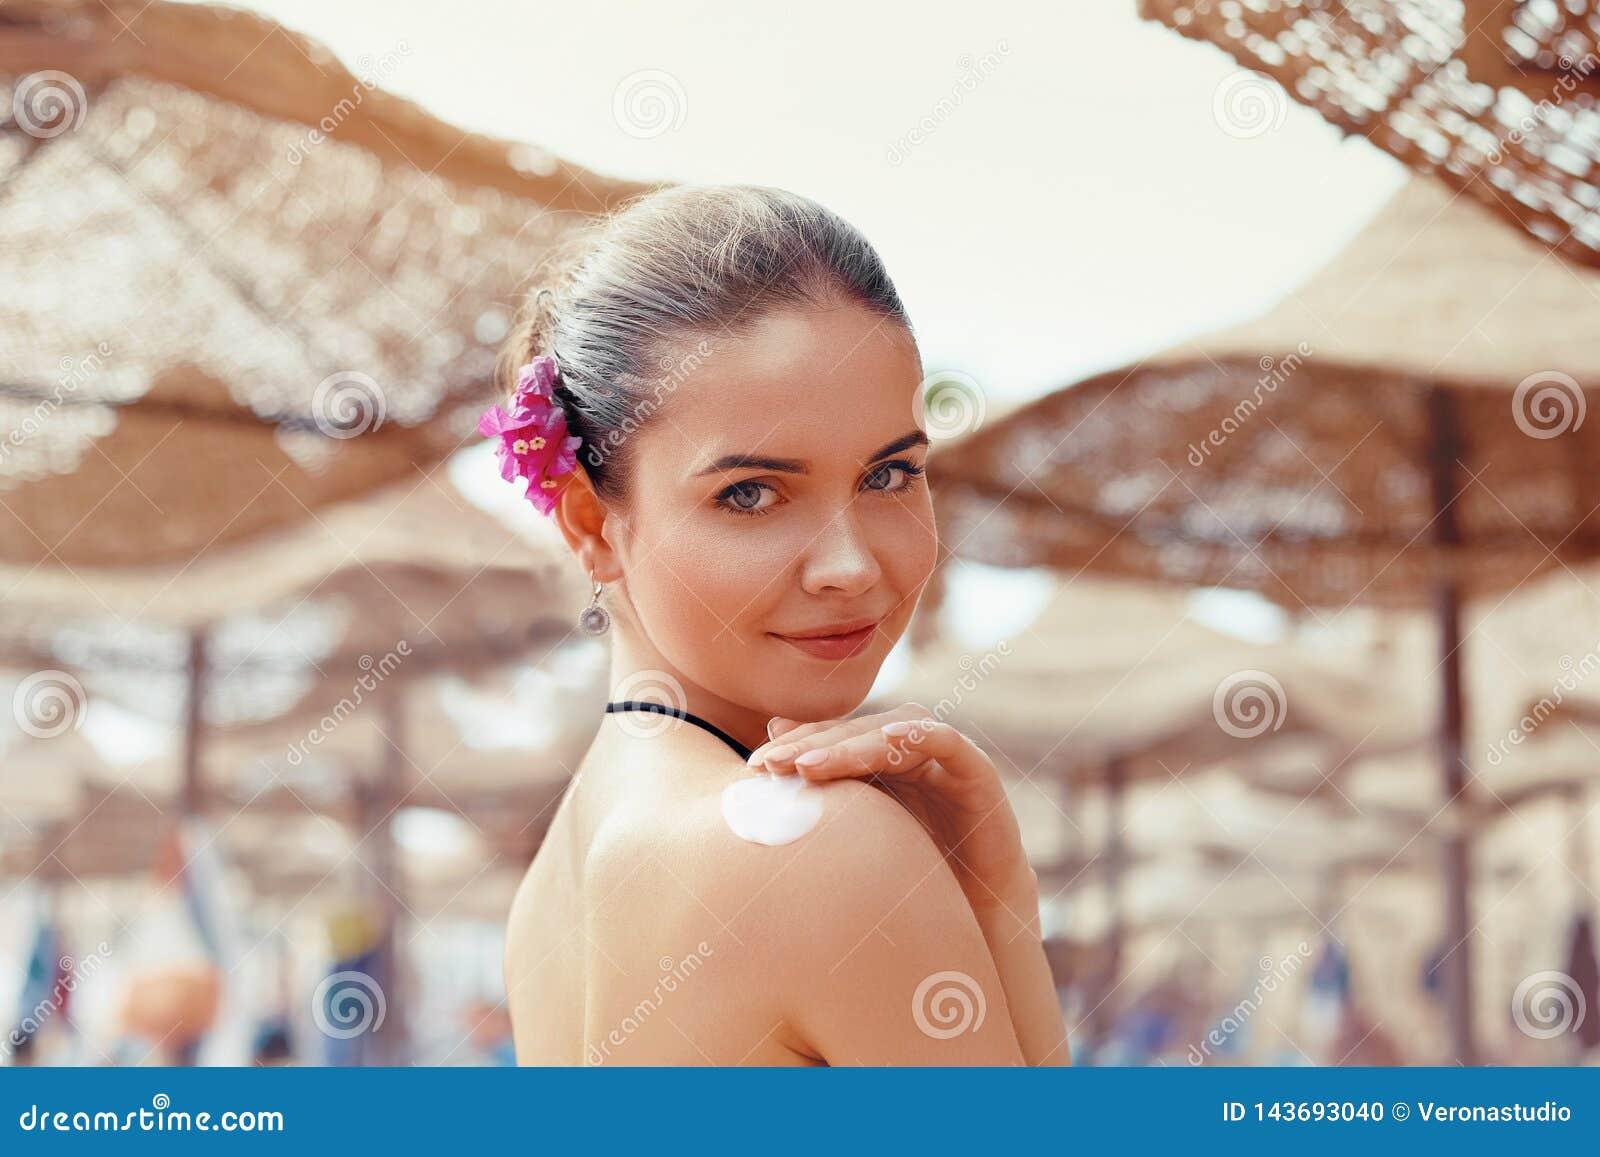 Beautiful young woman in bikini smear protective cream on the skin on the beach under the sun.